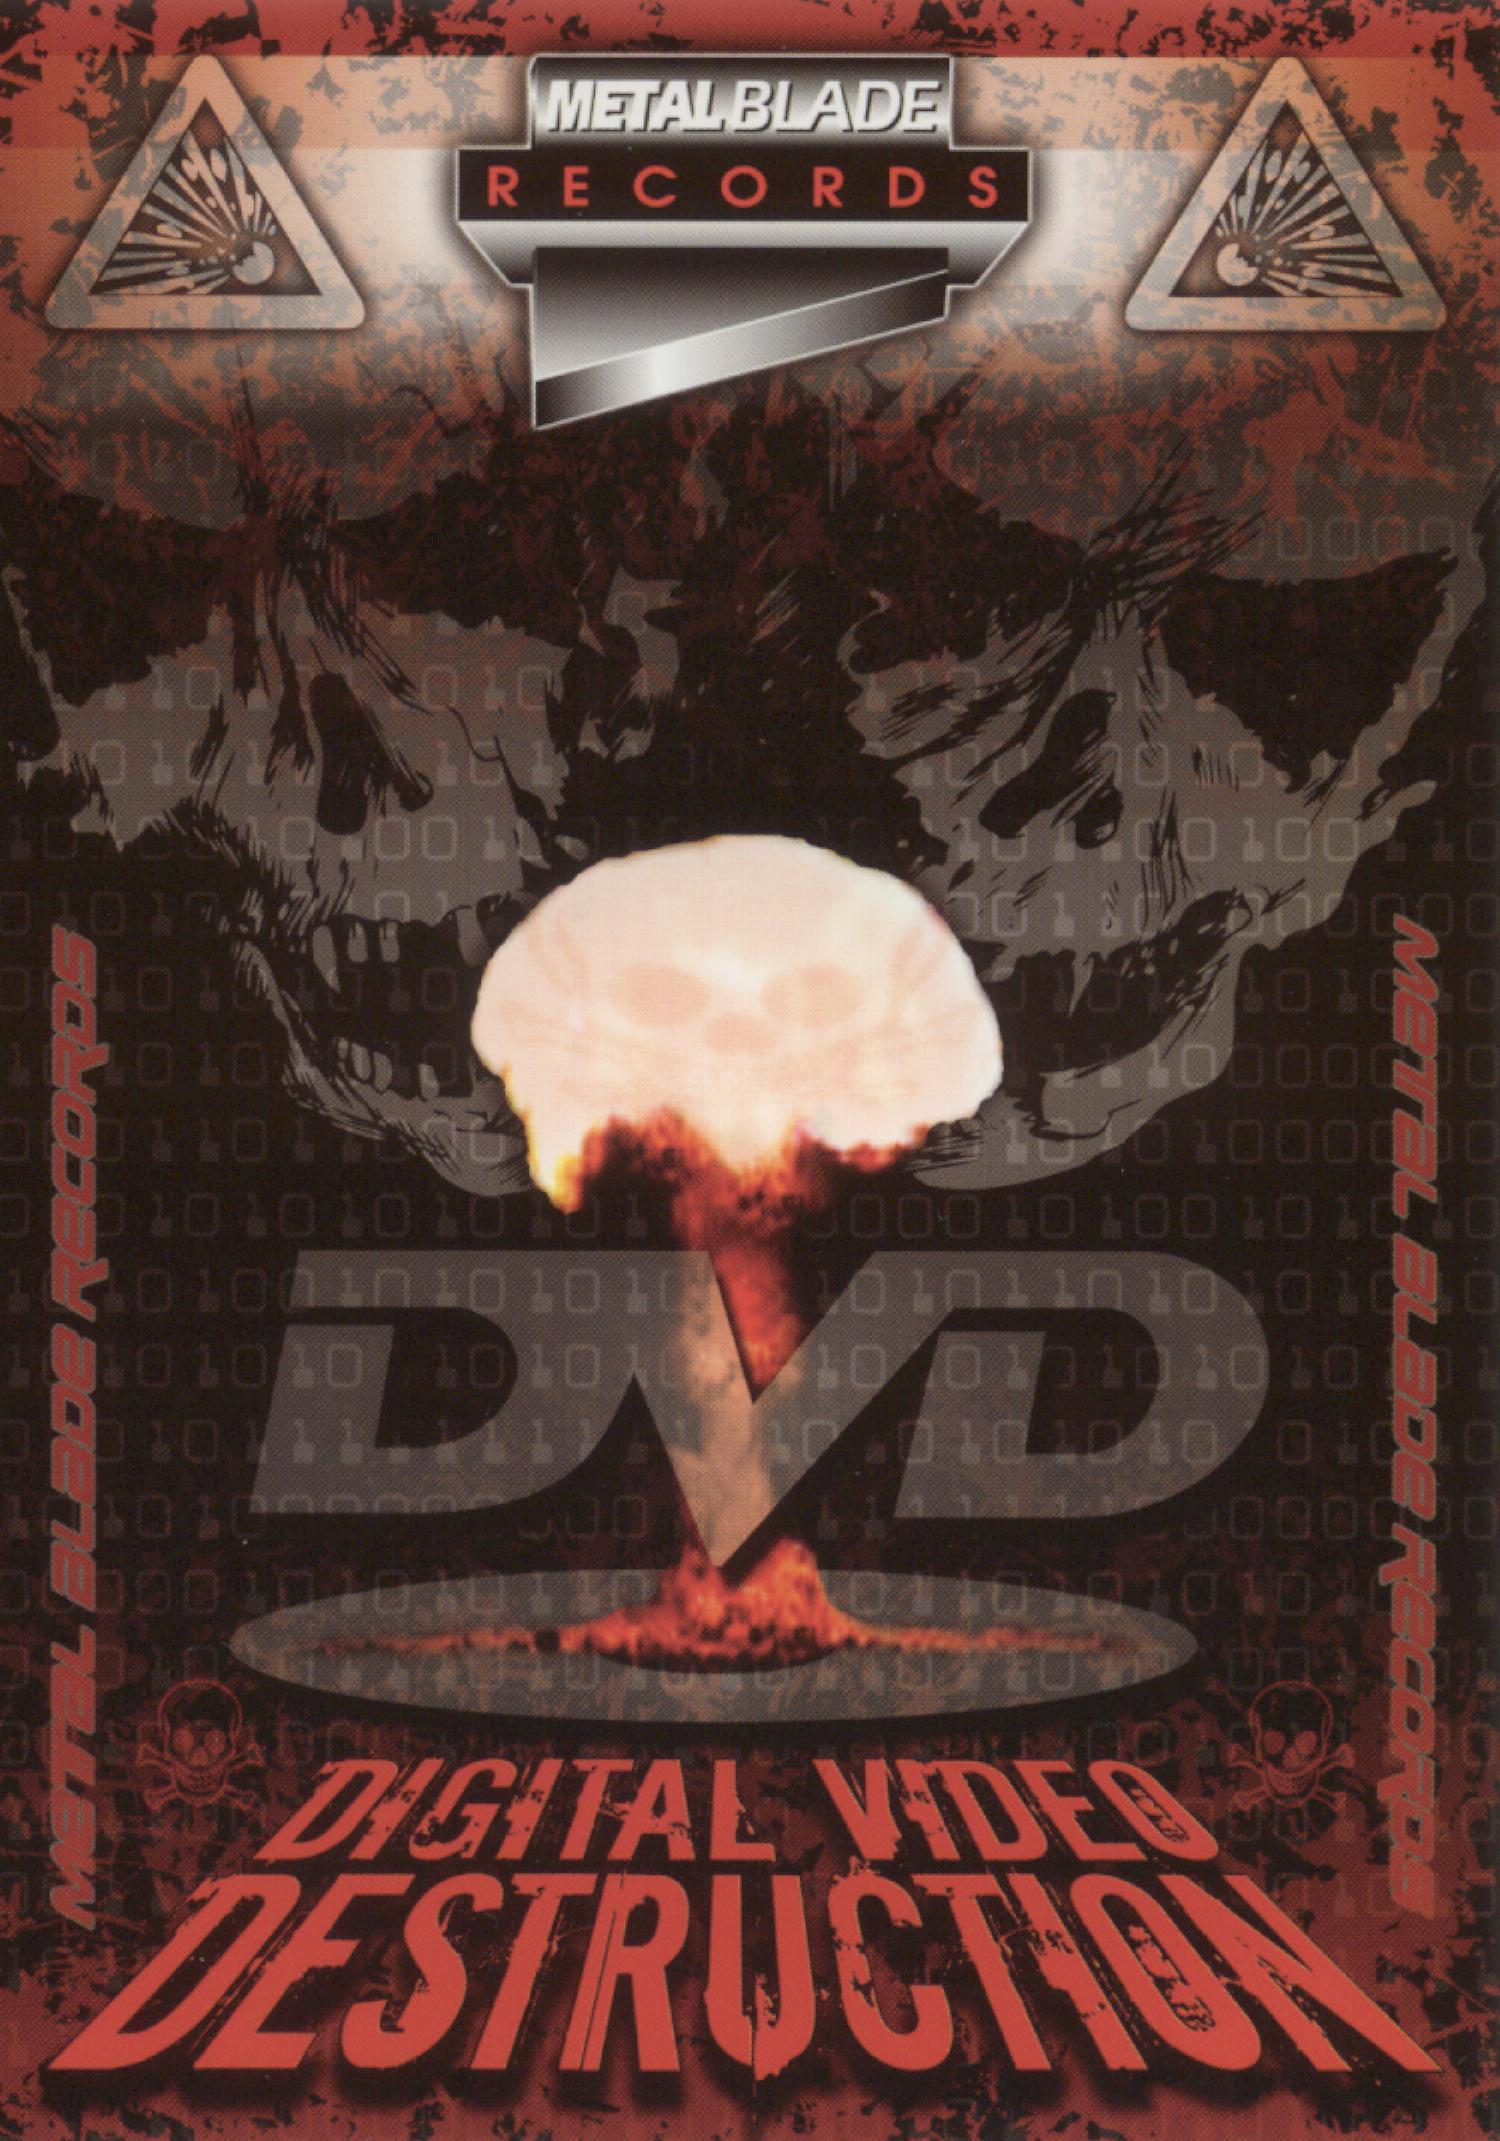 Digital Video Destruction